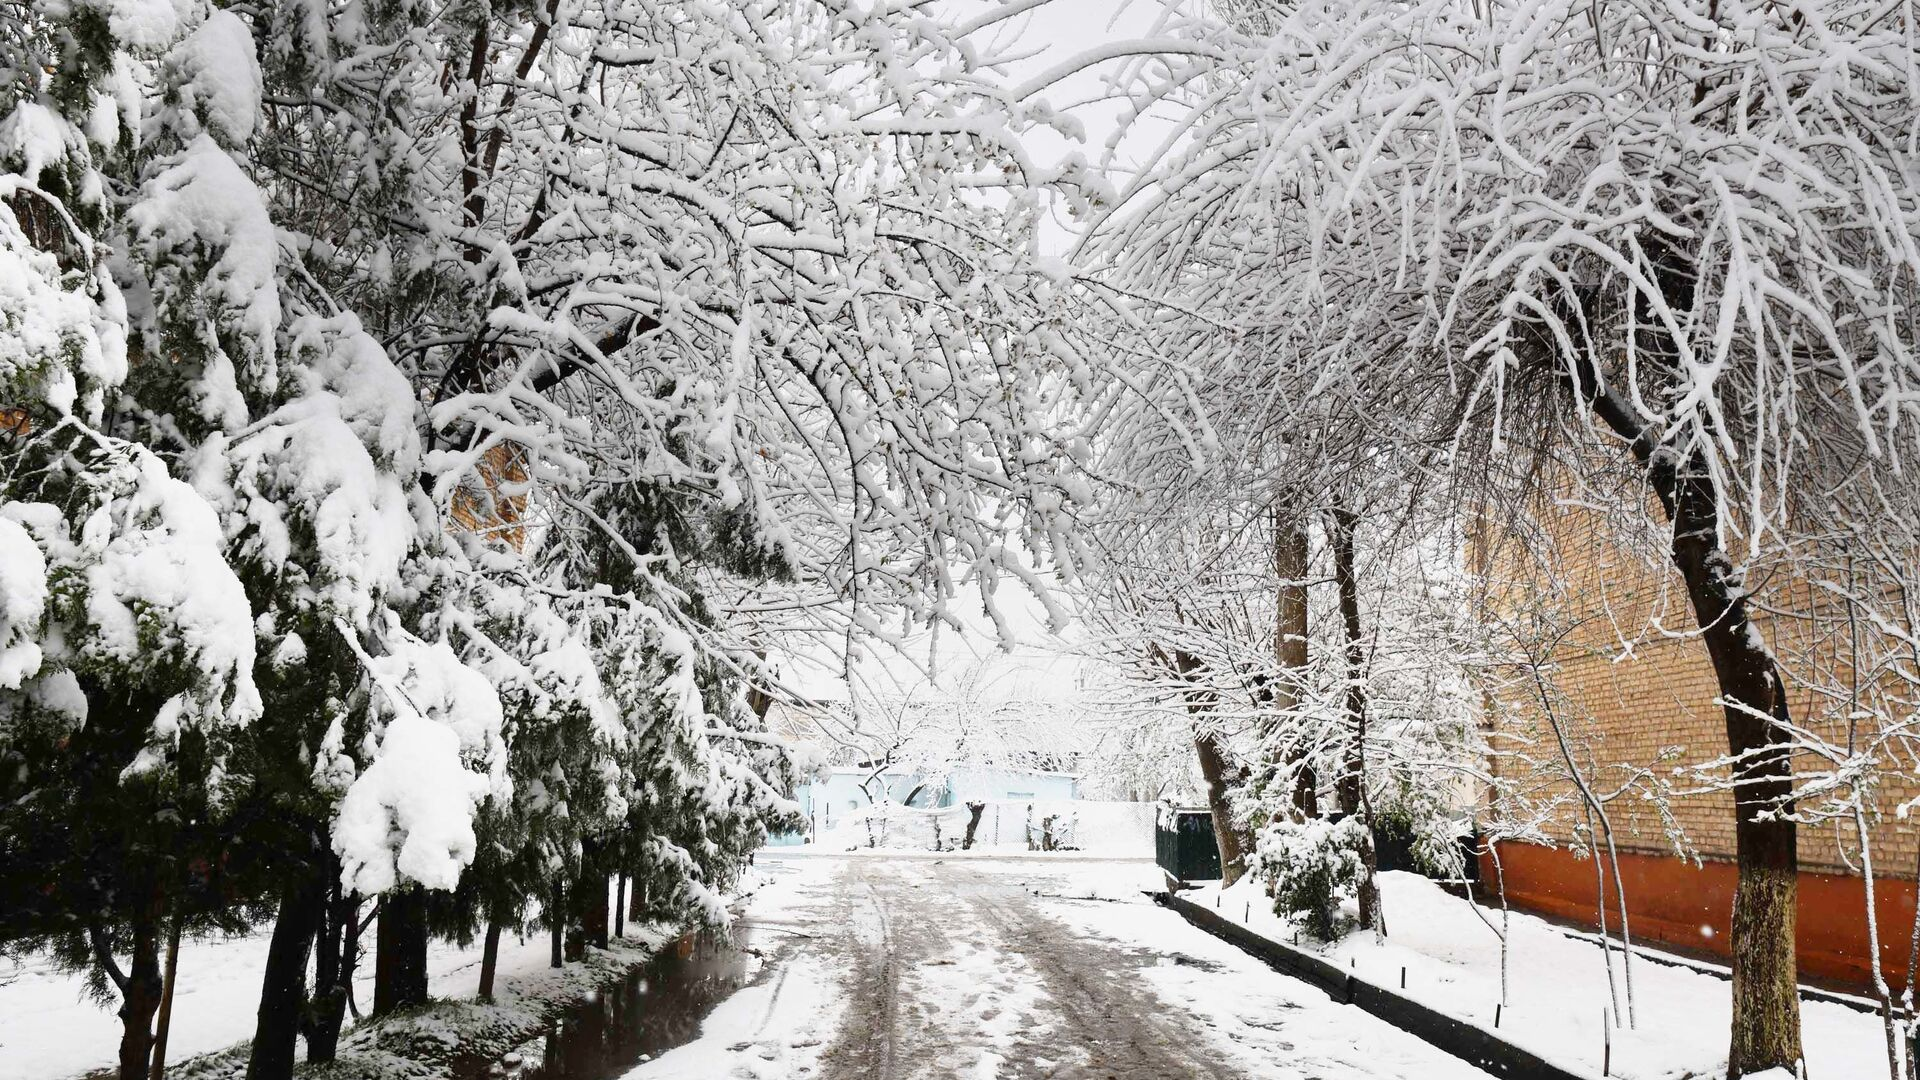 Душанбе в снегу - Sputnik Таджикистан, 1920, 30.09.2021